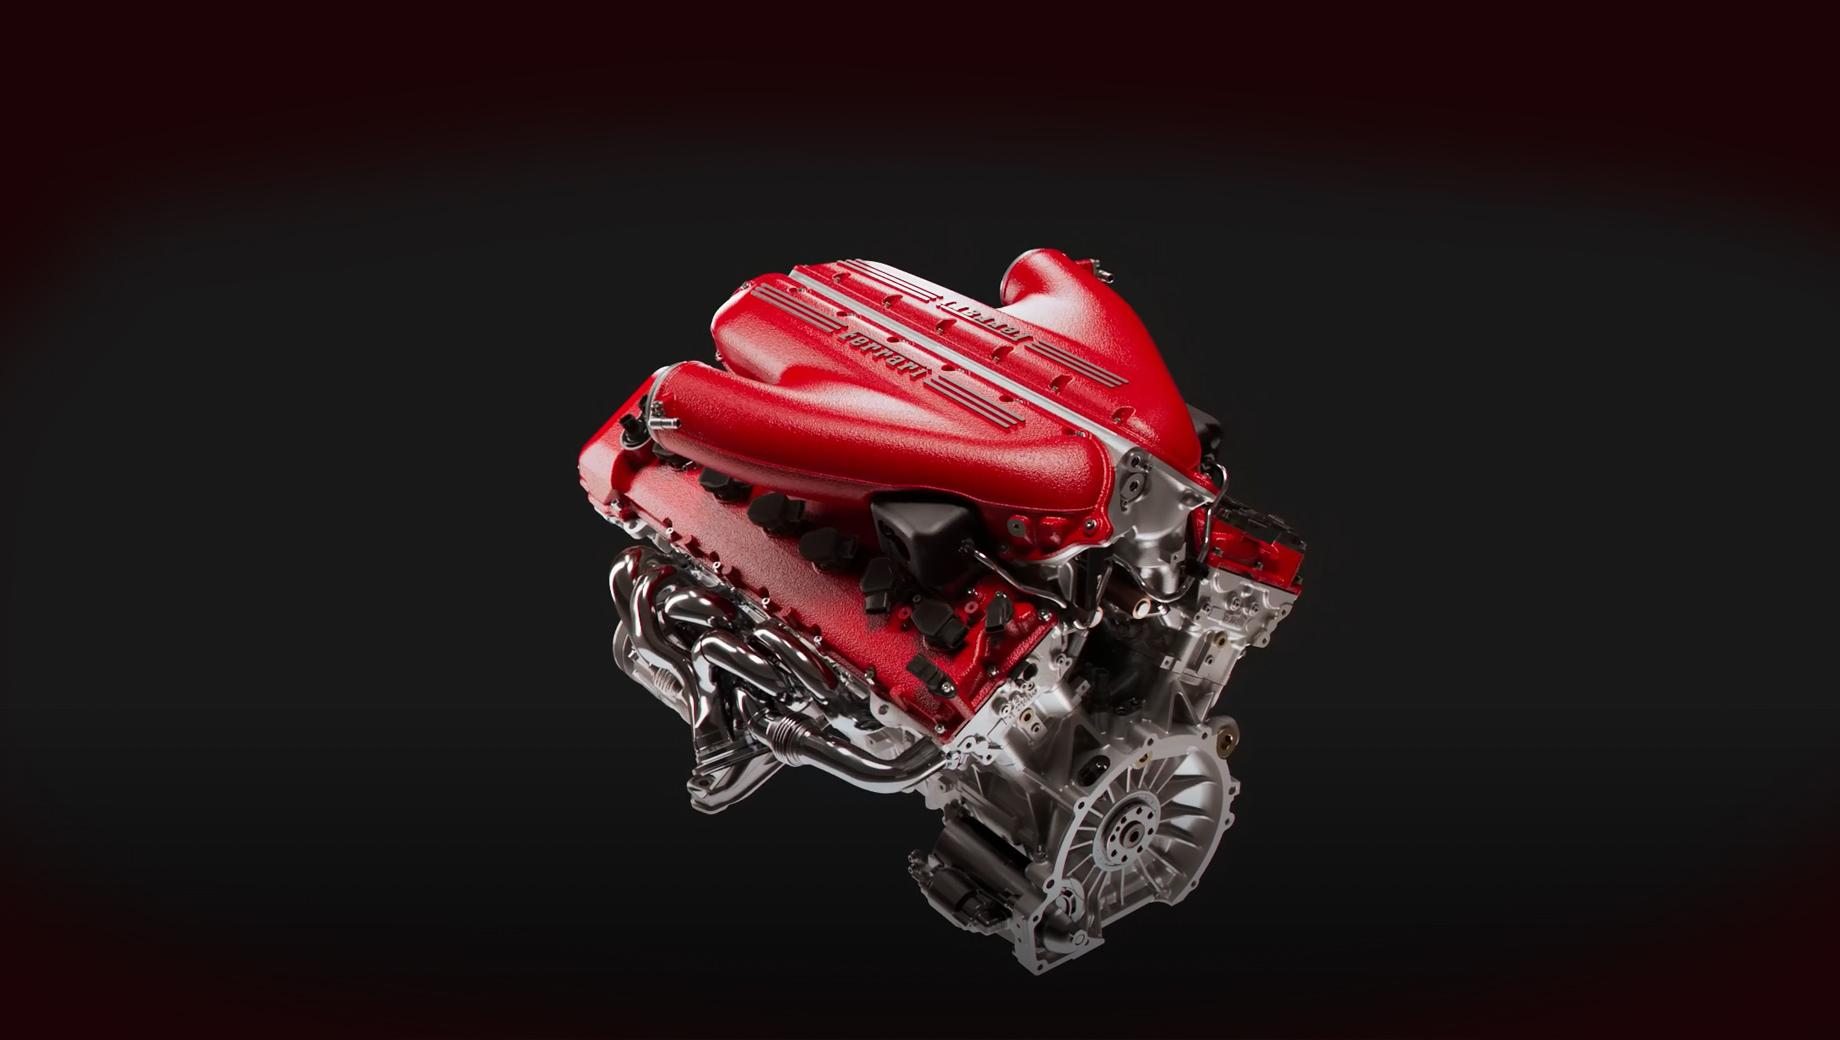 Ferrari готовит ещё более мощный мотор V12